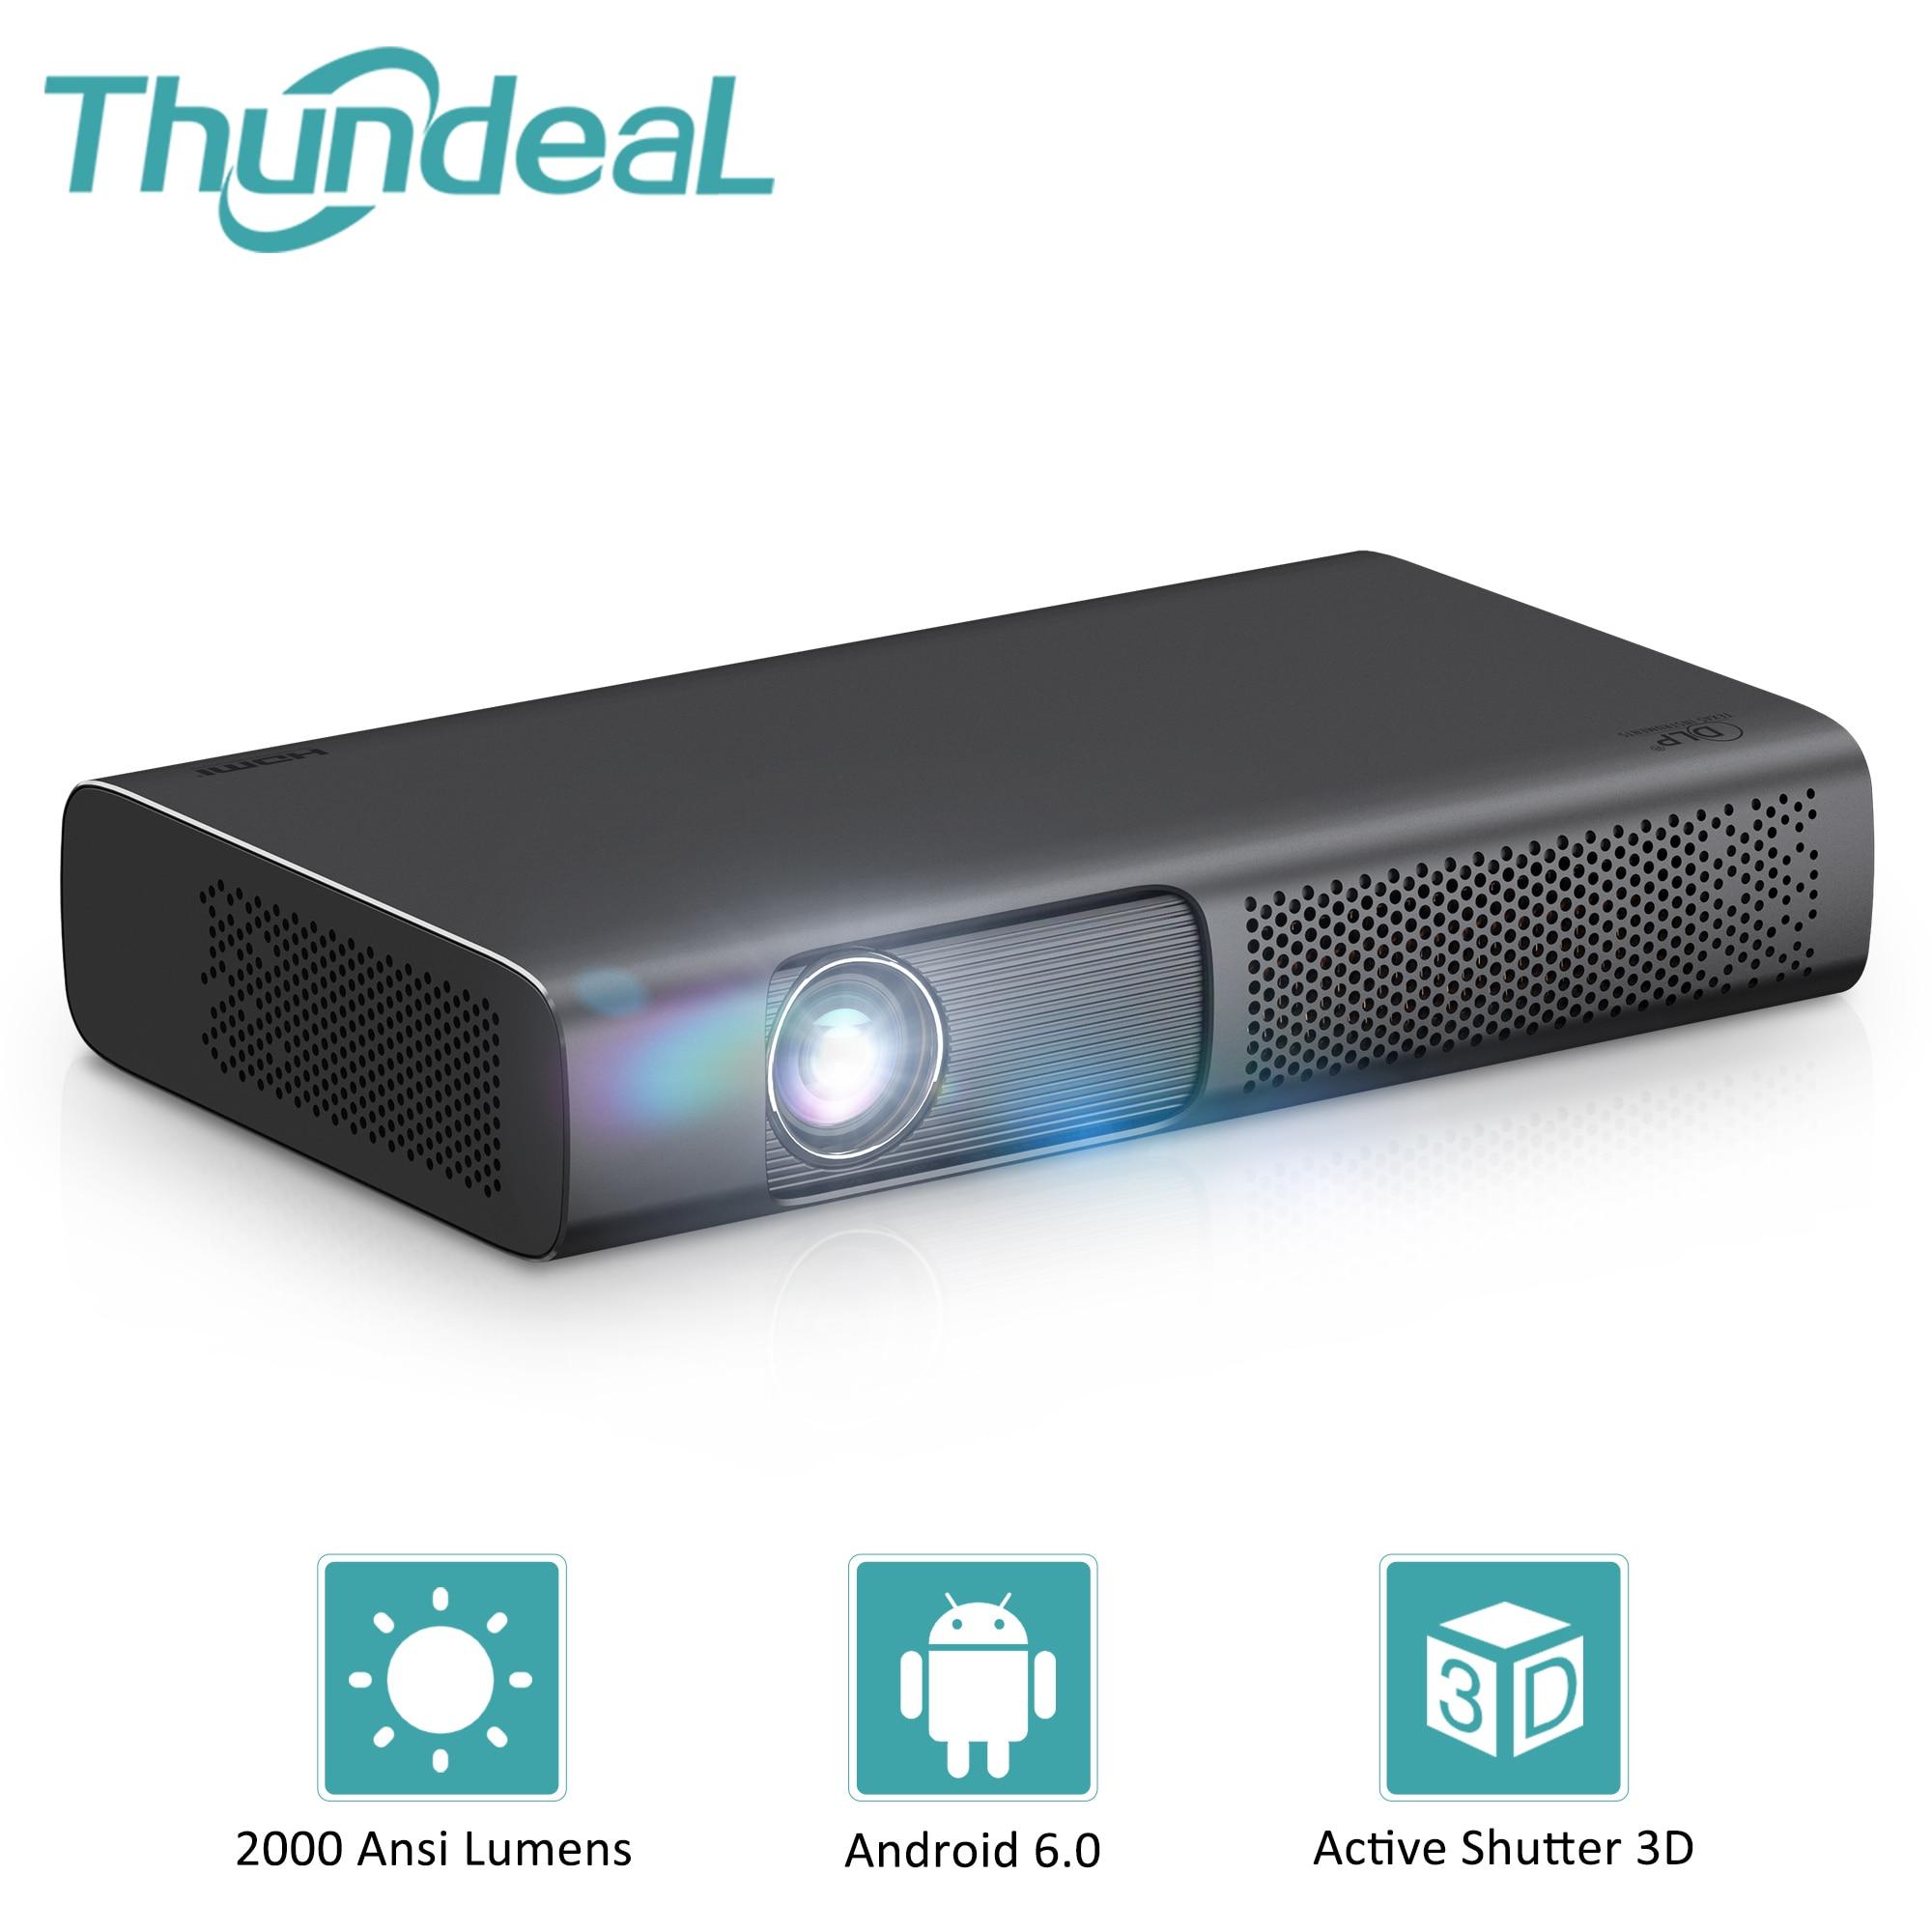 Thundeal новая технология DLP T615 проектор 1200 Ansi мультикубик для смартфона может передать по видео 1080P И 4k Мини проектор для дома с функций WiFi андро...